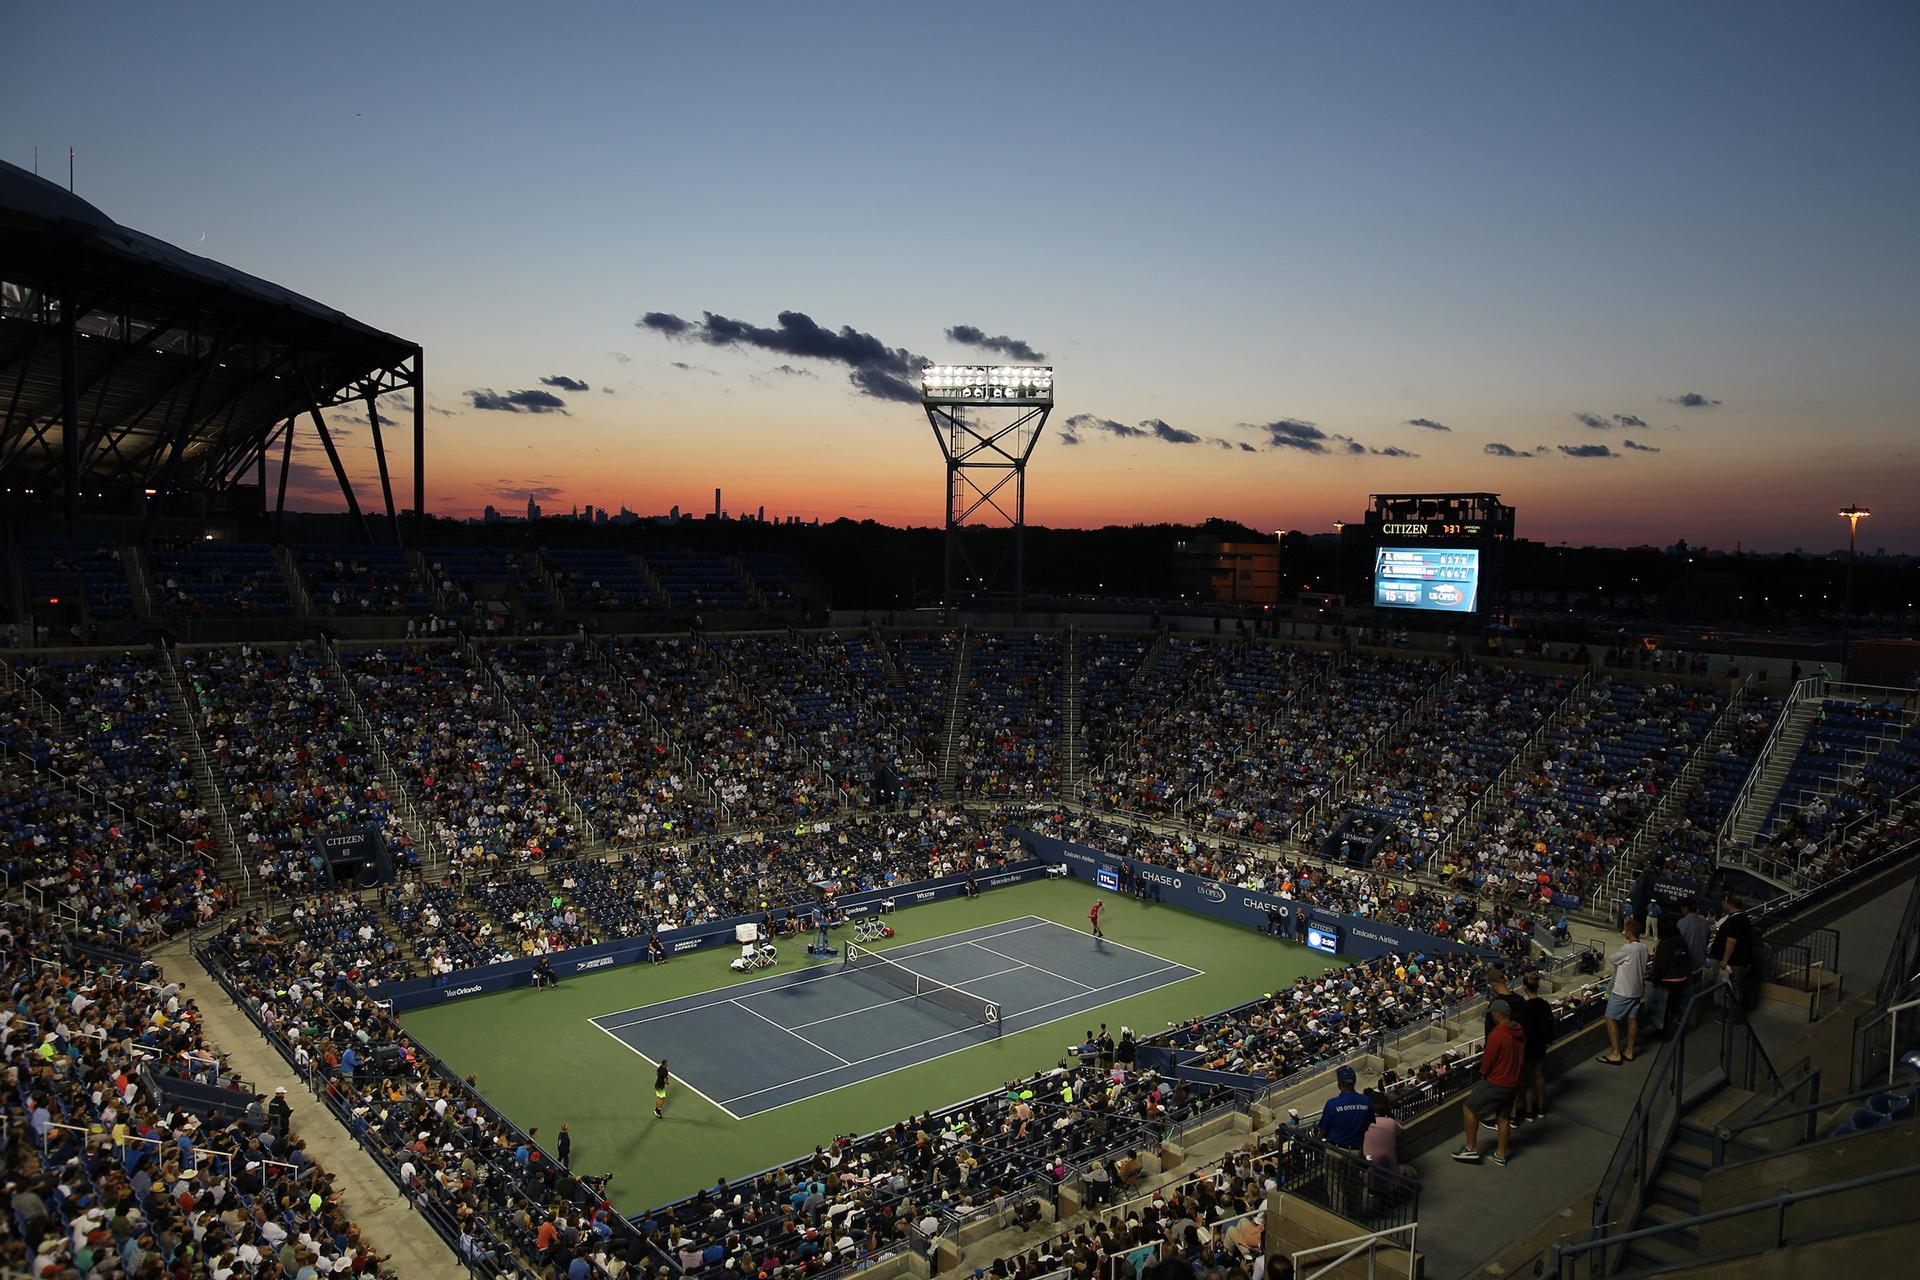 030916_Tennis_USOpen_8286